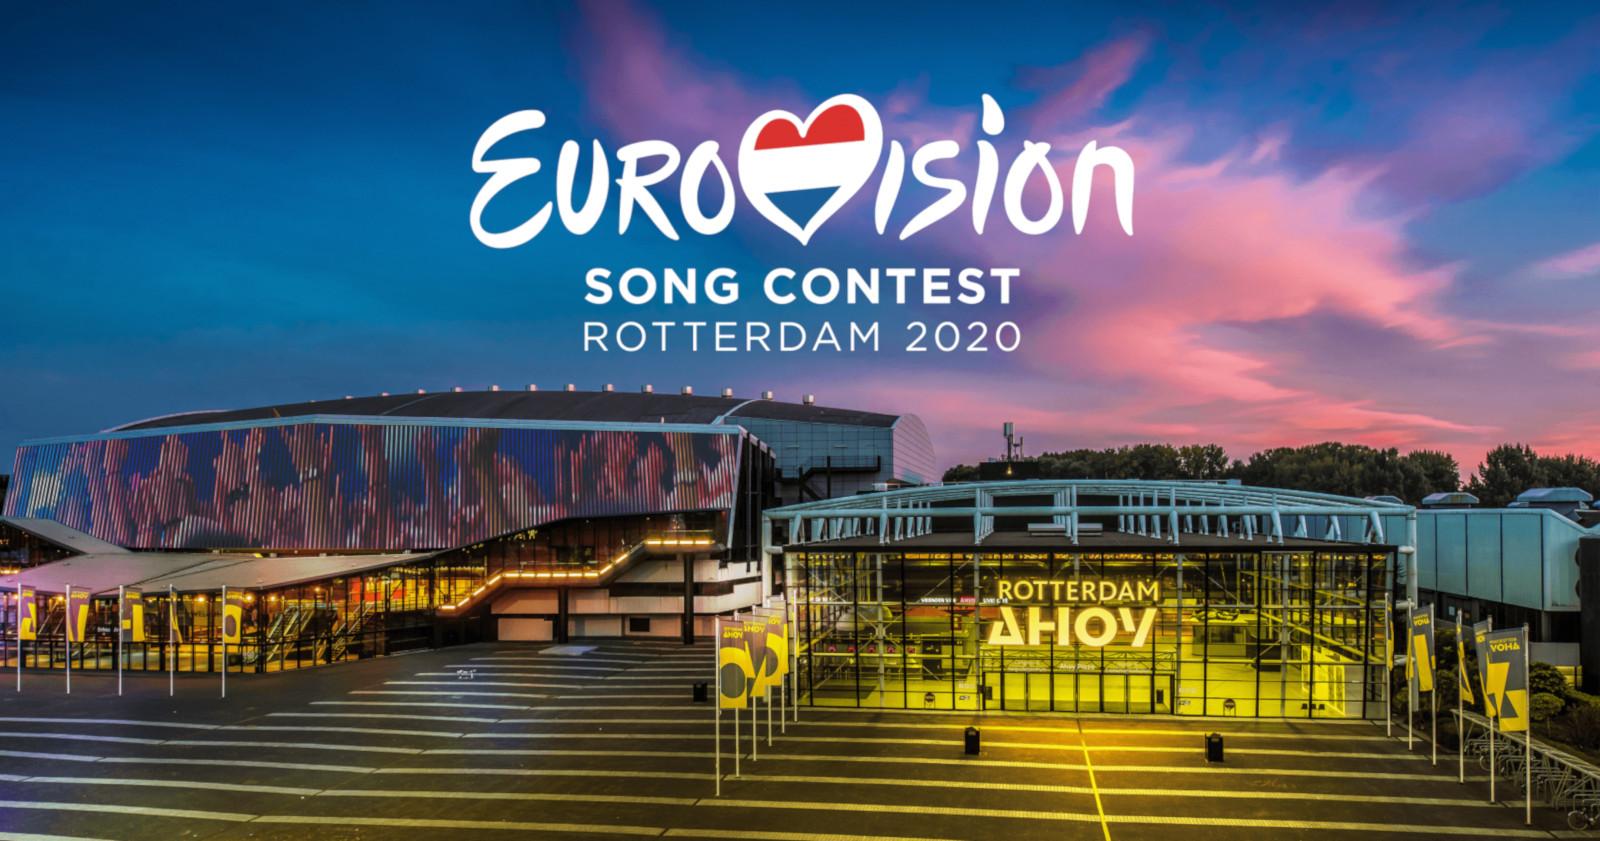 Официальная заставка фестиваля Eurovision.